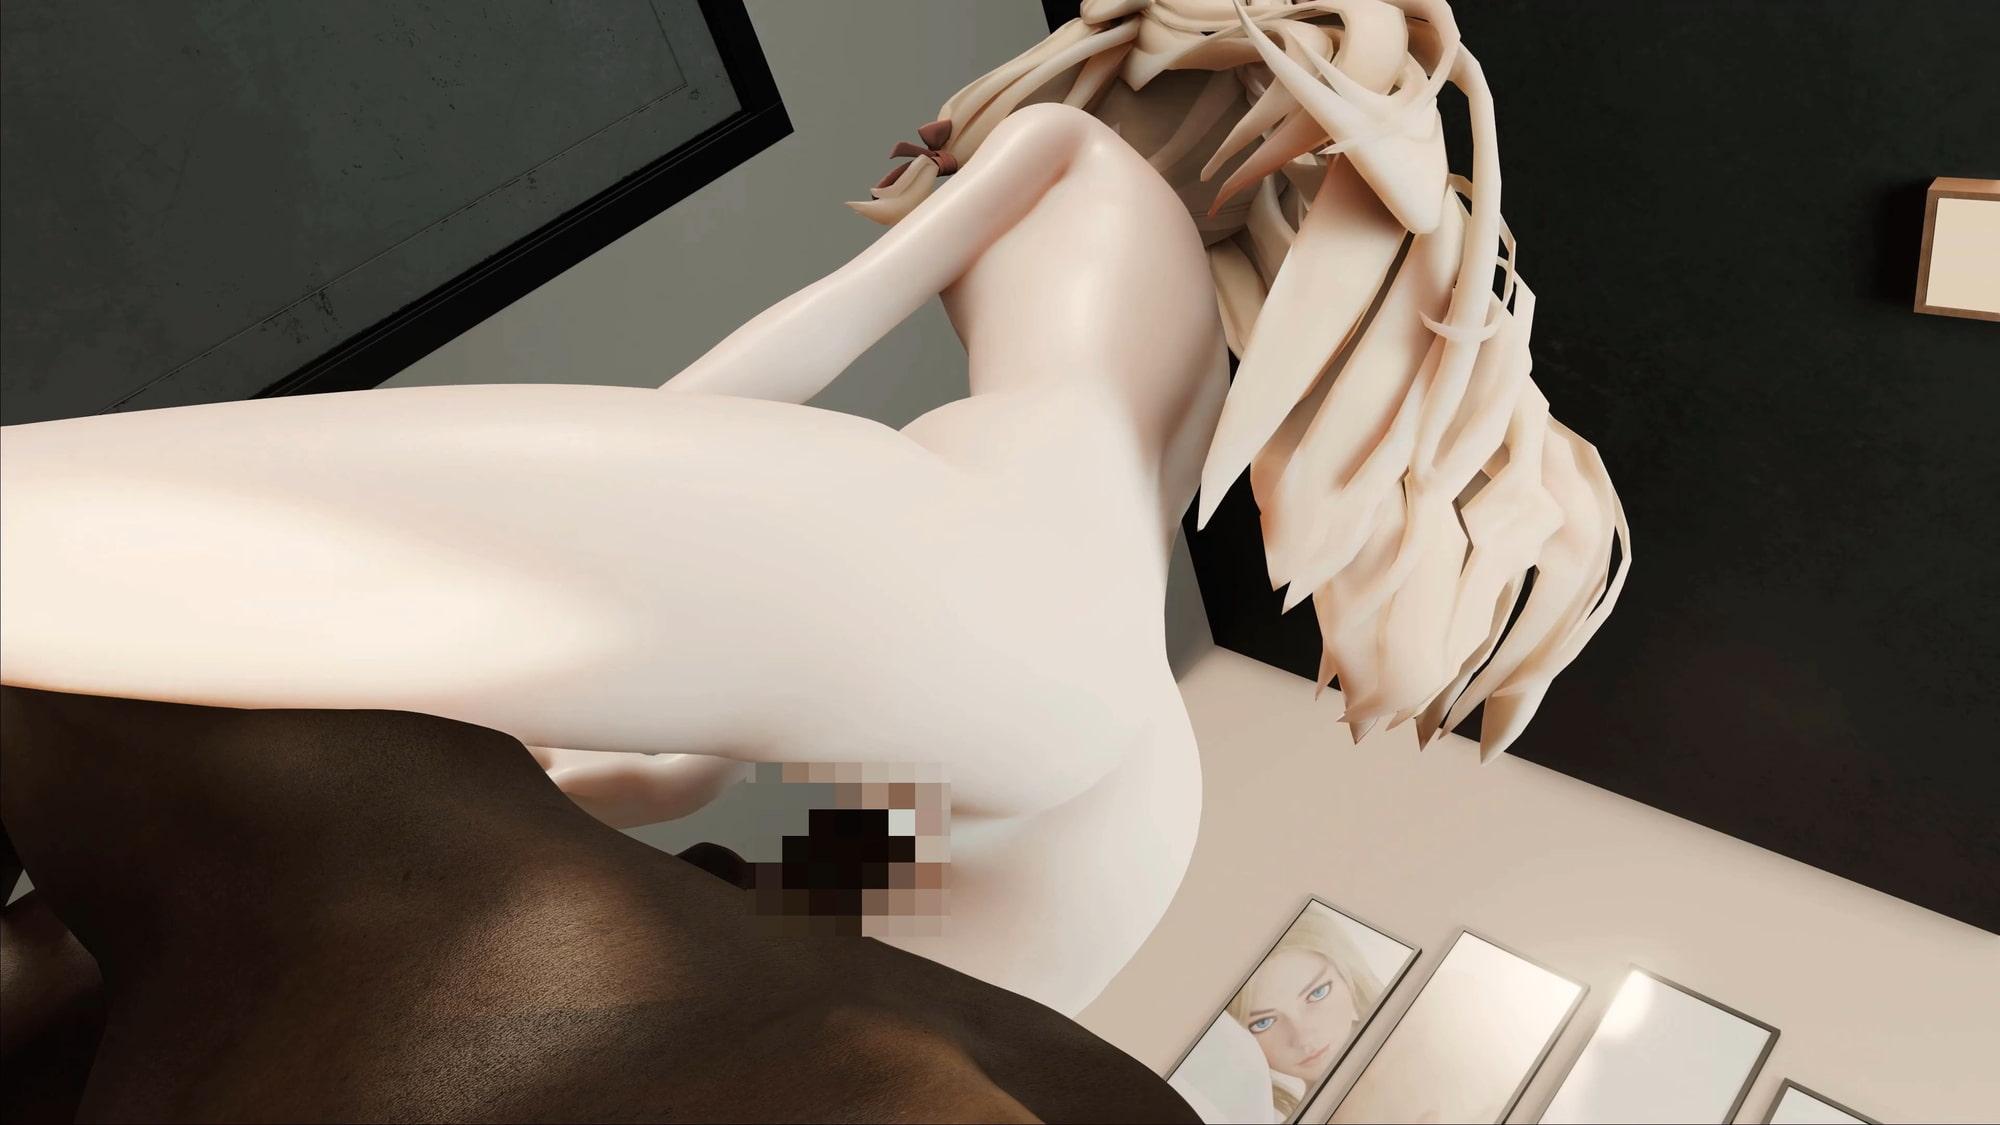 RJ350436 Loli Slut Chika JK for Big Dick  ビッグディックのためのロリ痴女チカJK [20211012]